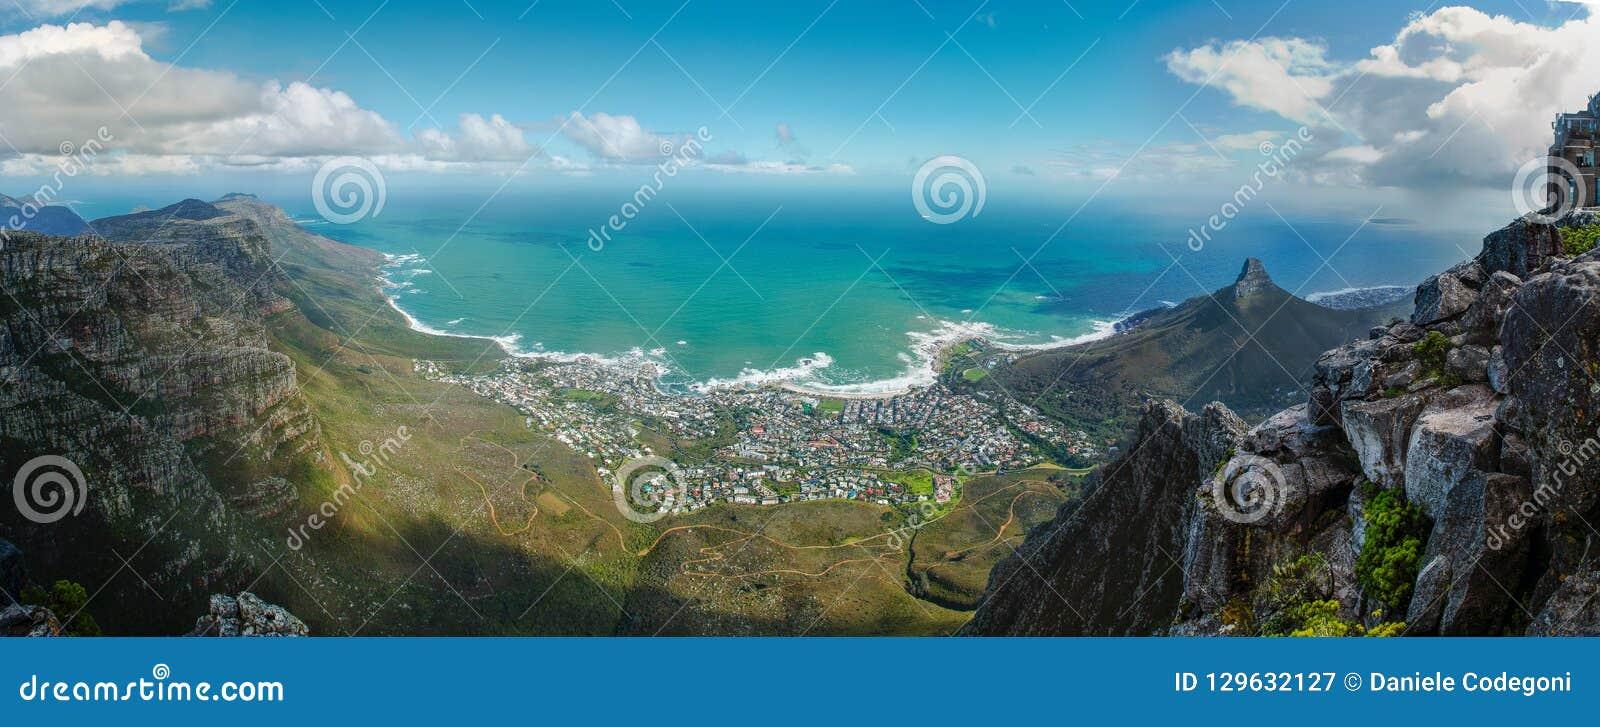 Cape Town sikt från tabellberget Panorama till Atlanticet Ocean